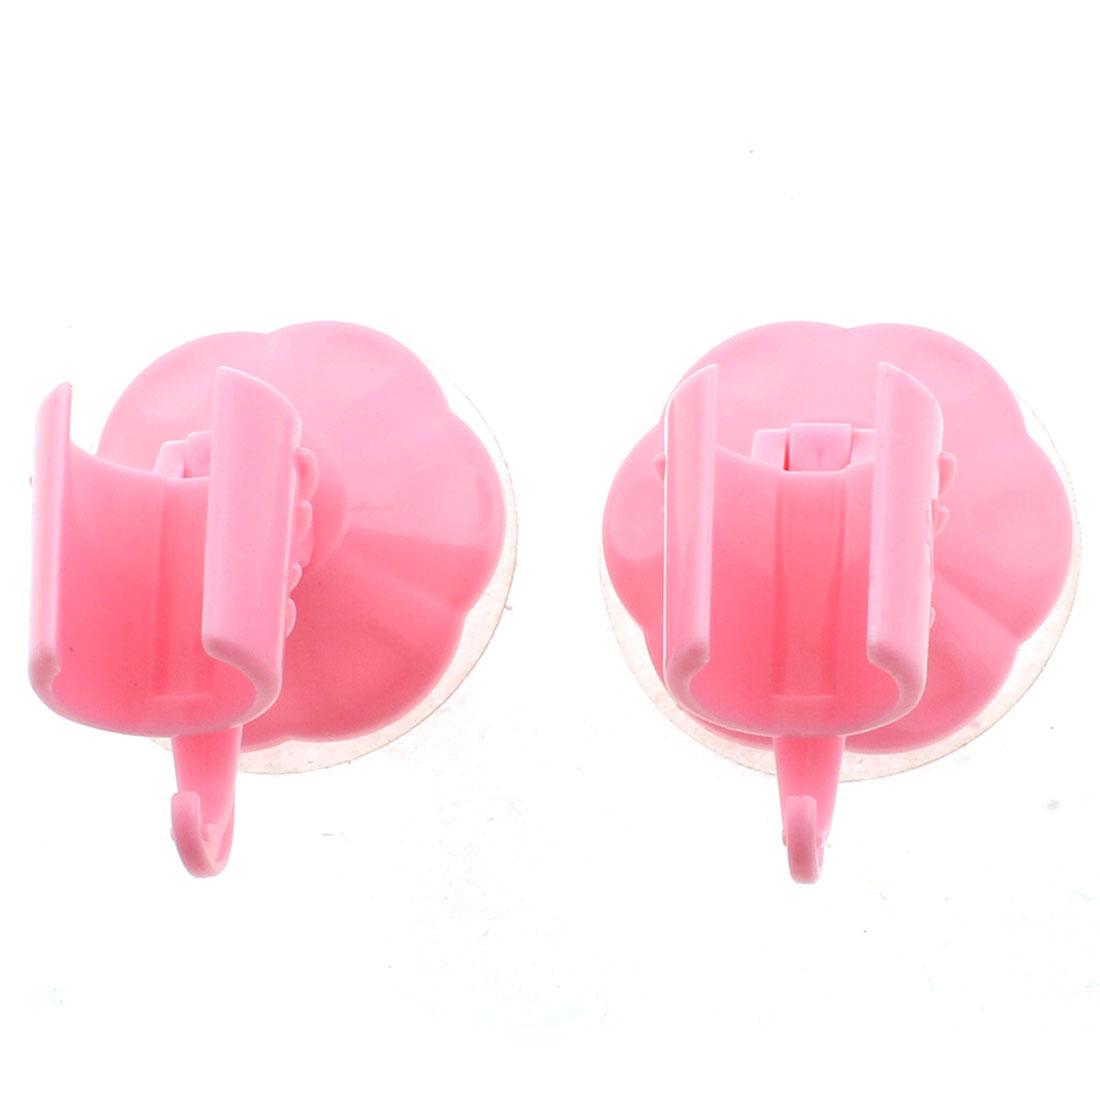 Home Bathroom Adjustable Suction Cup Shower Head Holder Pink 2pcs